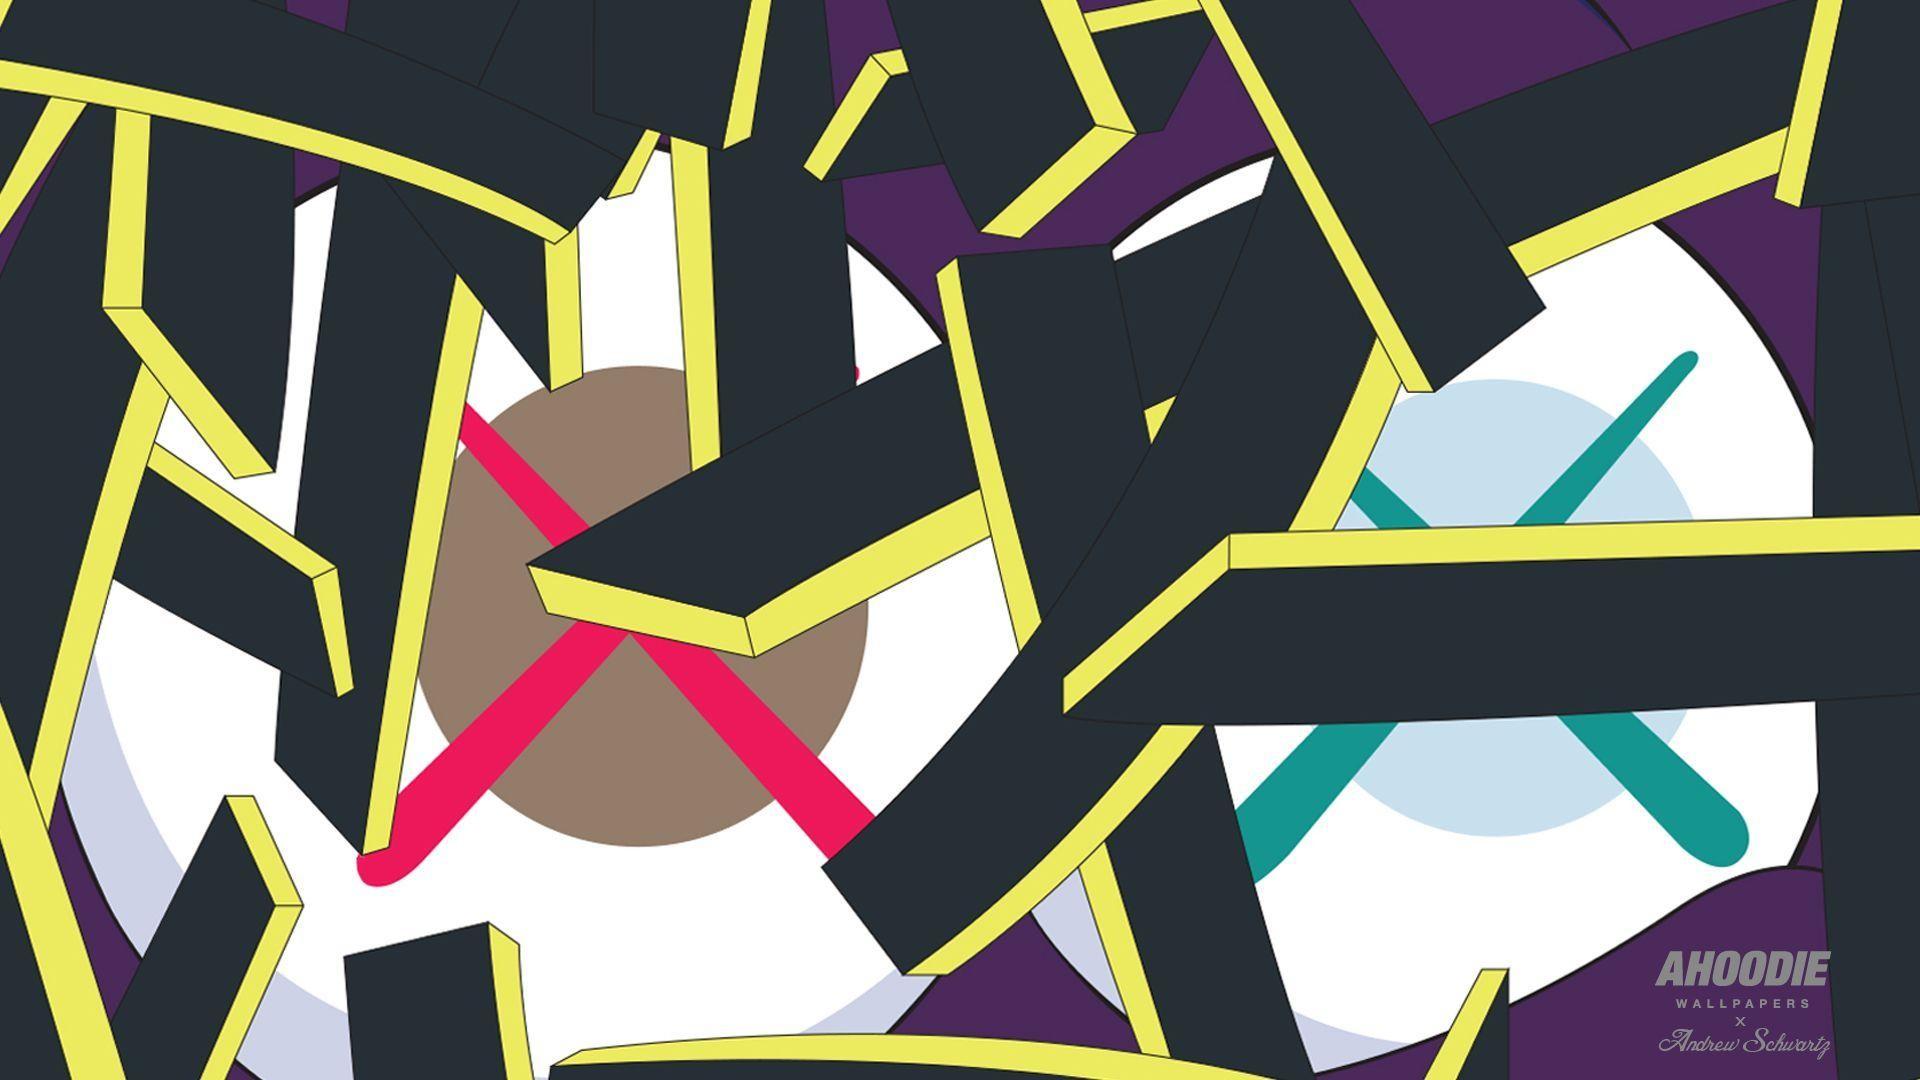 Kaws Wallpaper - ktrdecor.com